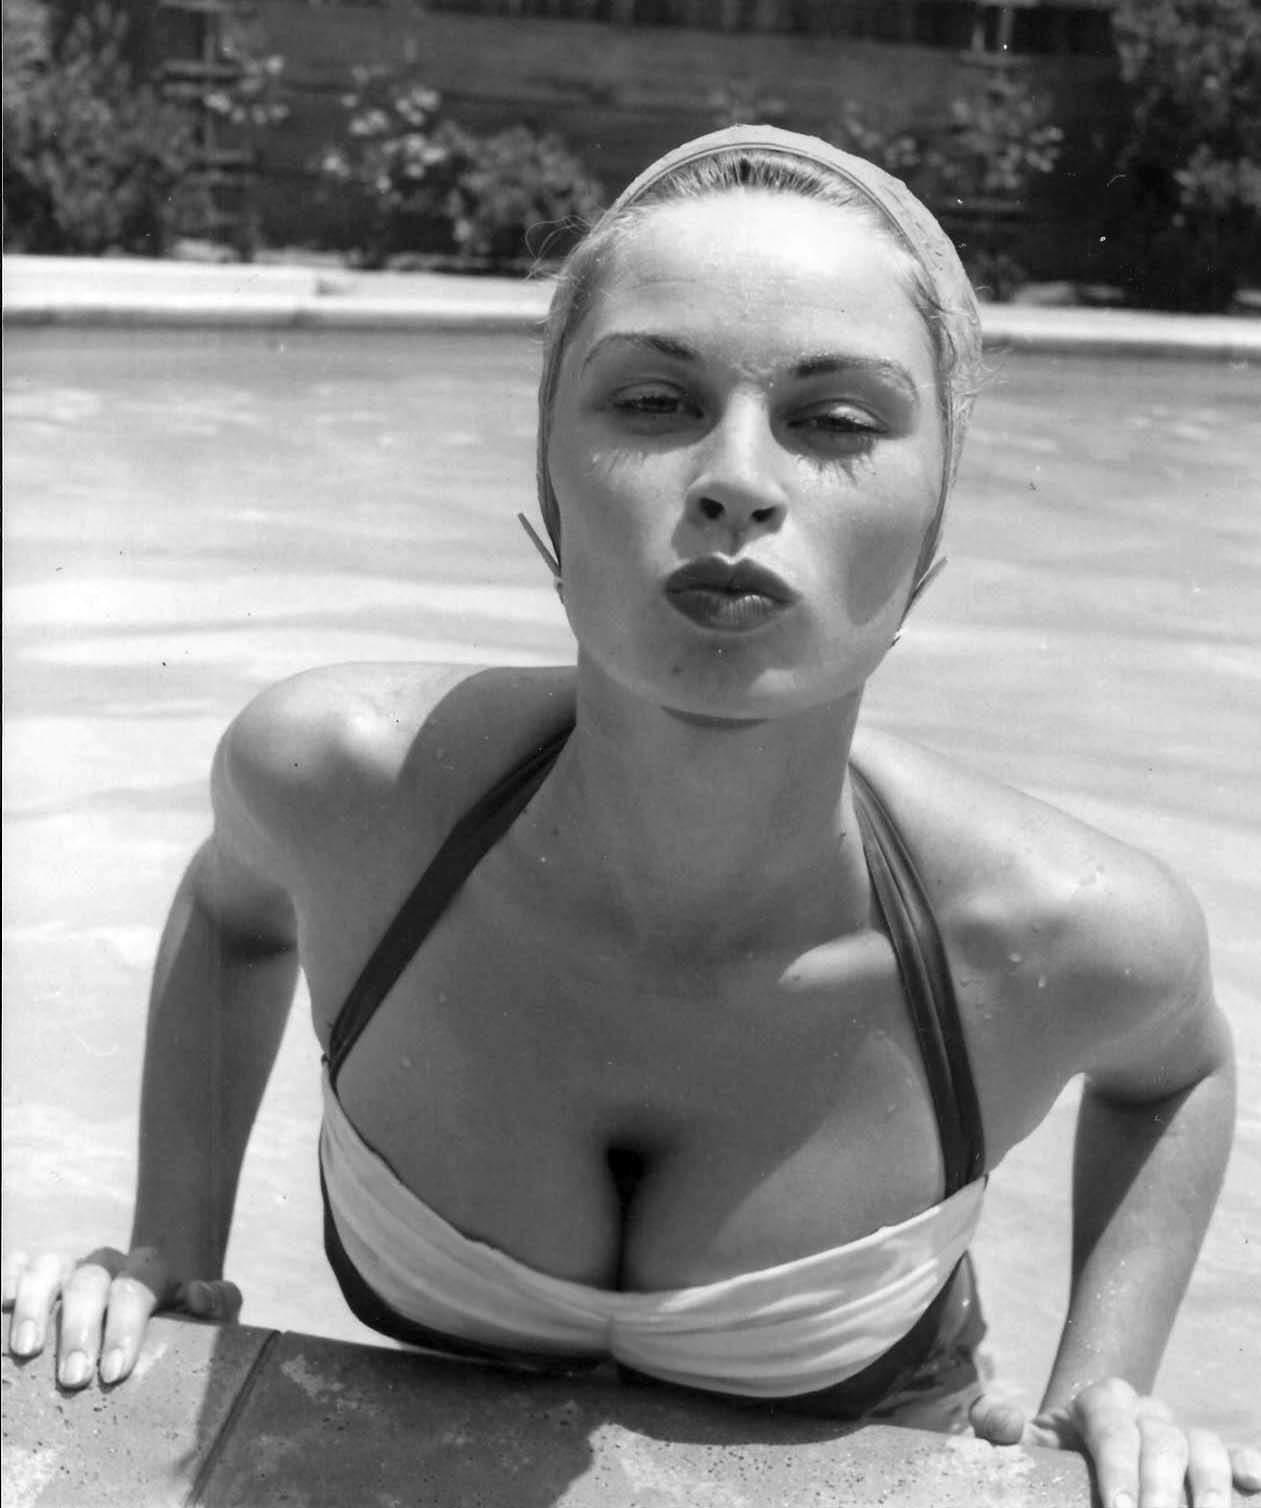 irish mccalla nude photo